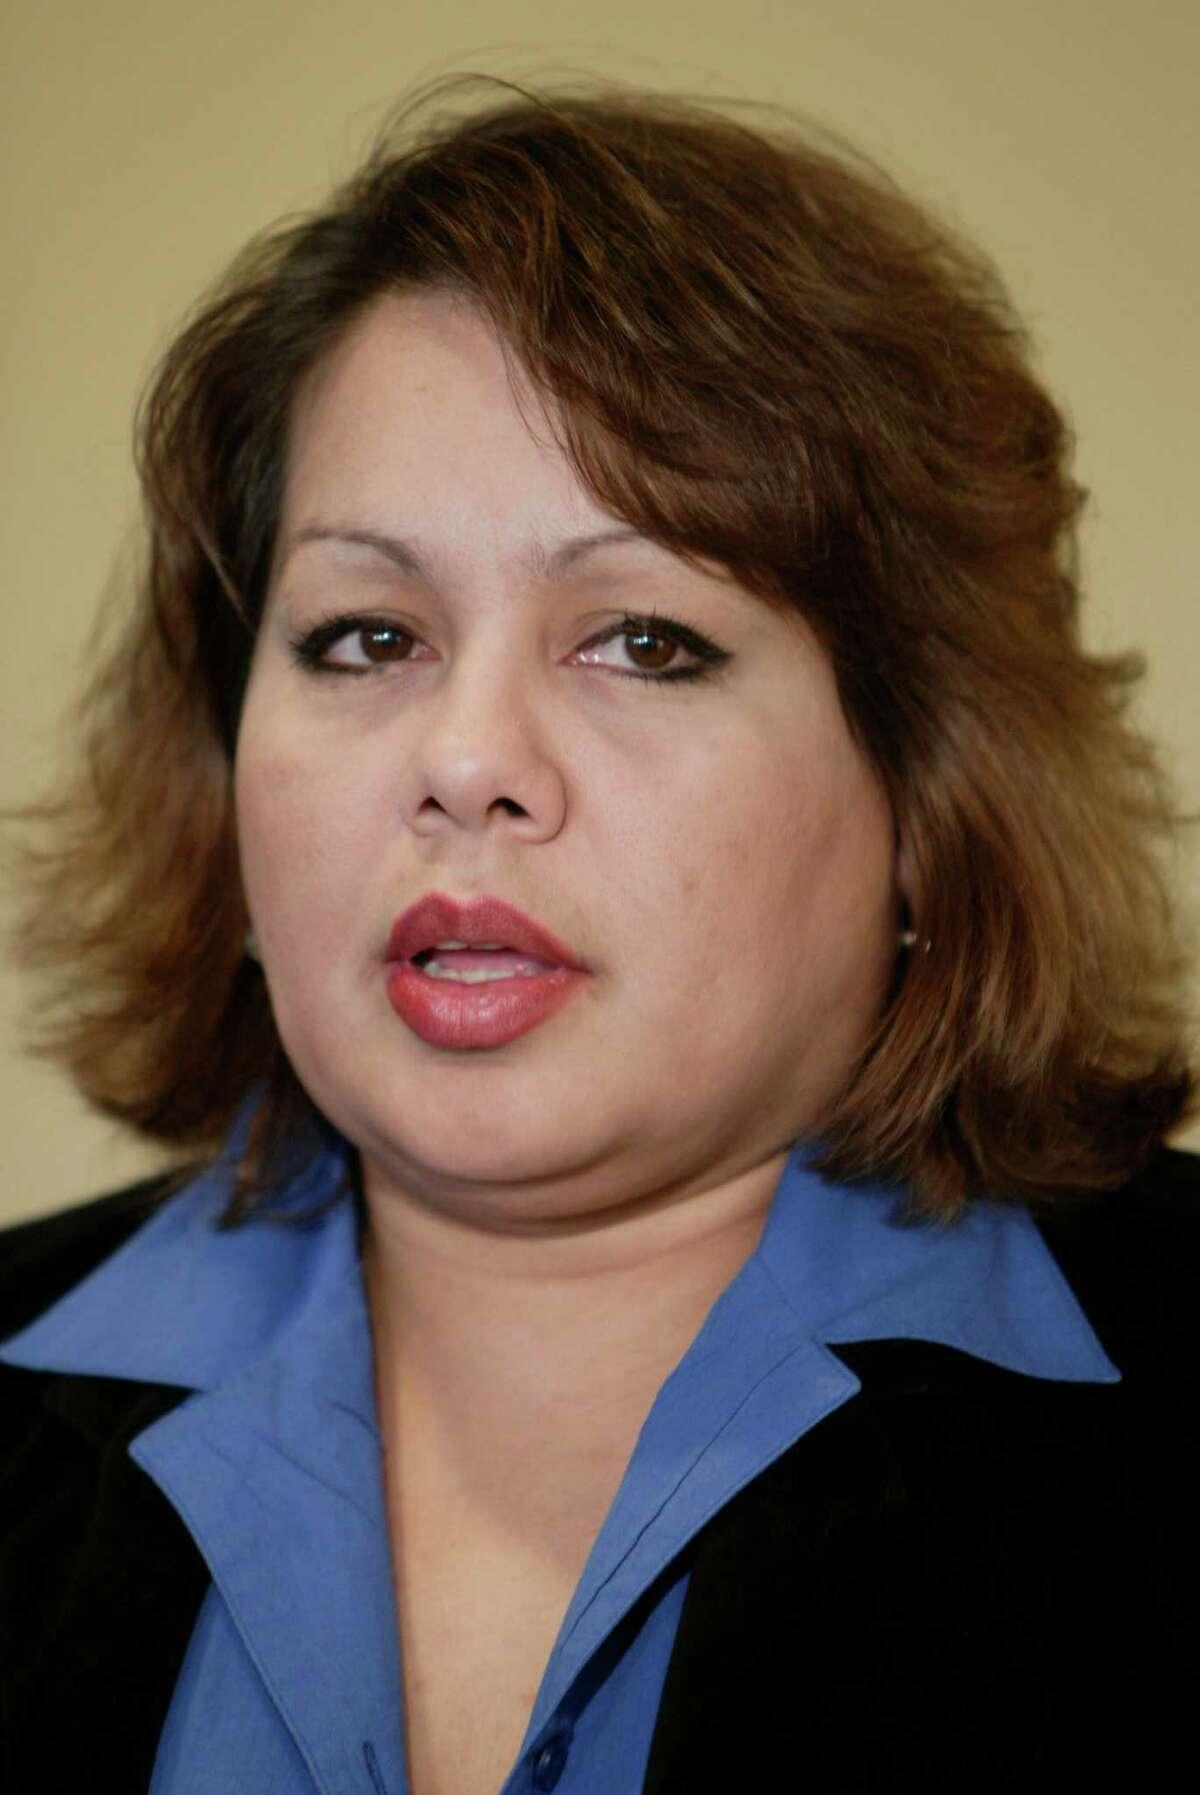 Susan Delgado, a former stripper, is running for Sen. Mario Gallegos' seat.